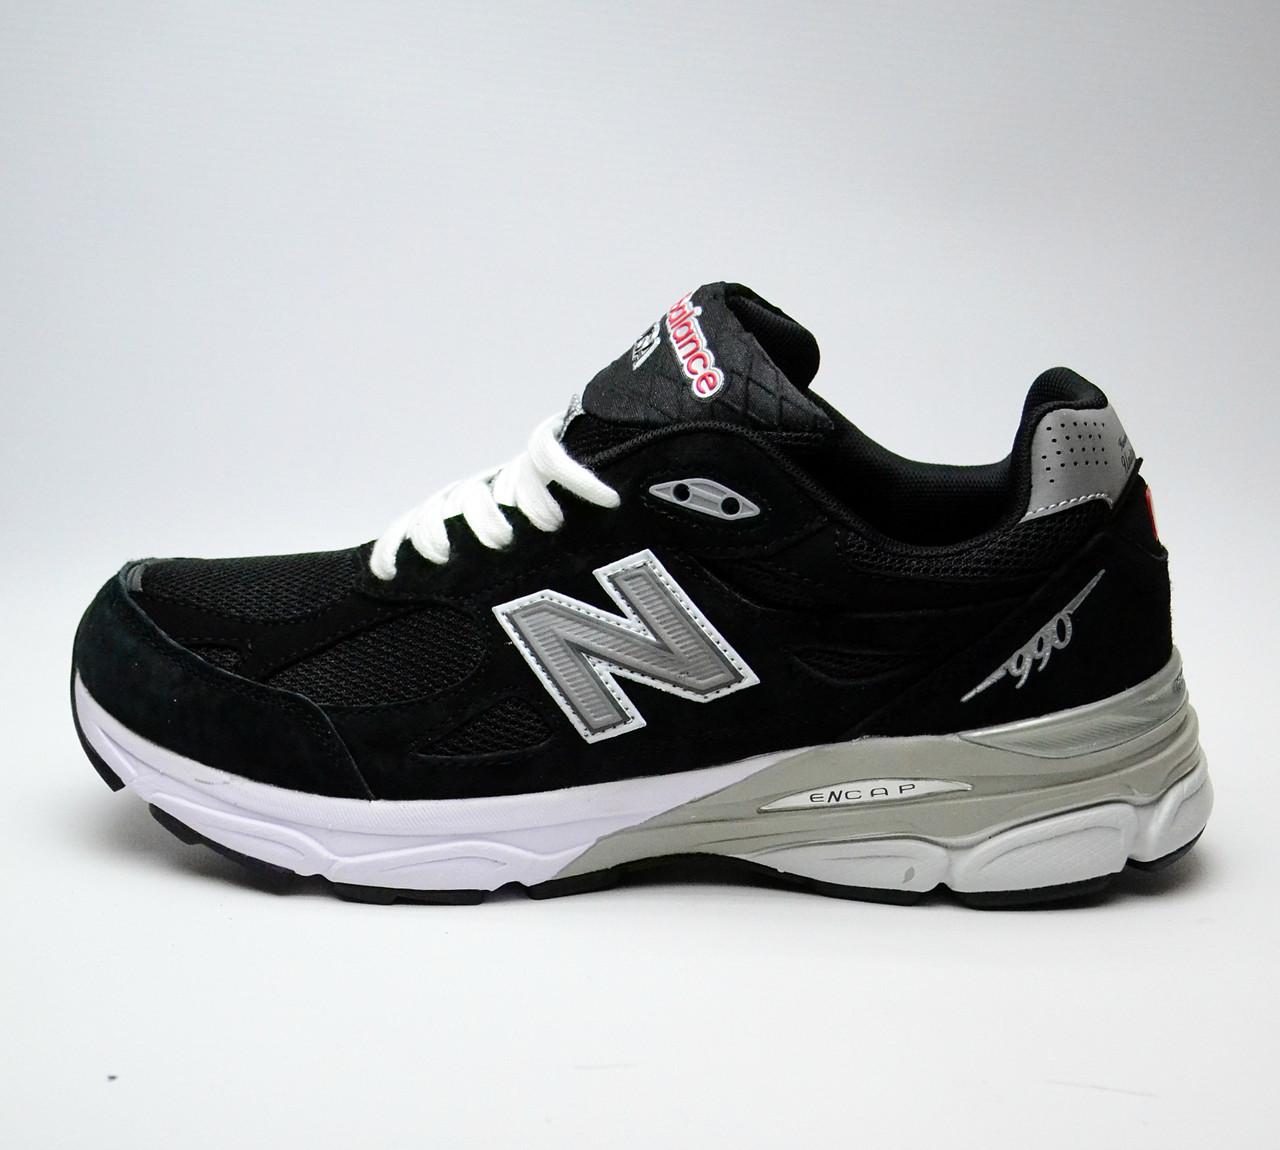 Мужские кроссовки для прогулок New Balance M993 Running Walking Shoes (нью  баланс) (реплика 5b1f22e2f65a3